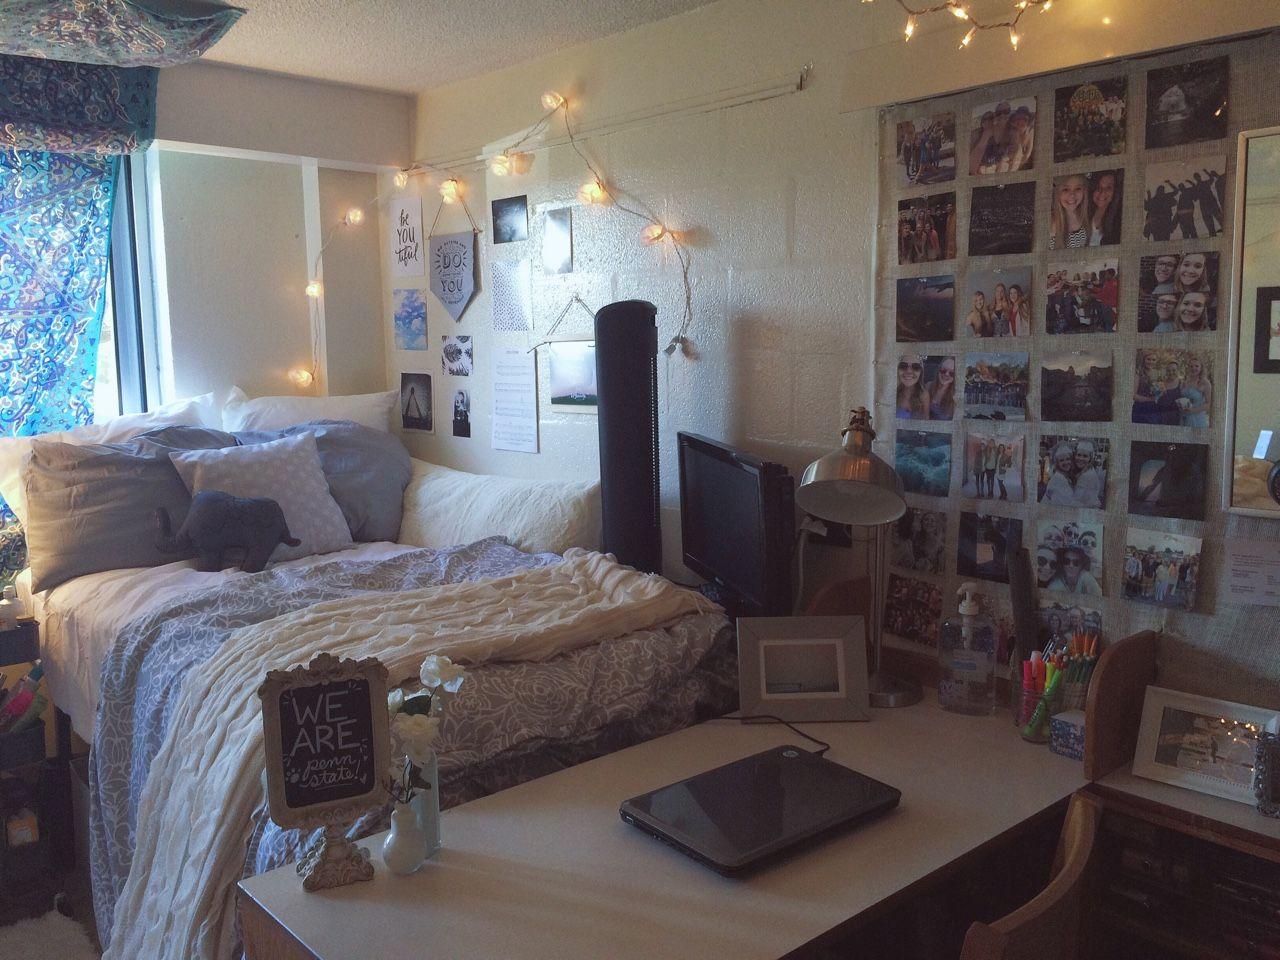 Cool Dorm Rooms Penn State University Cool Dorm Rooms